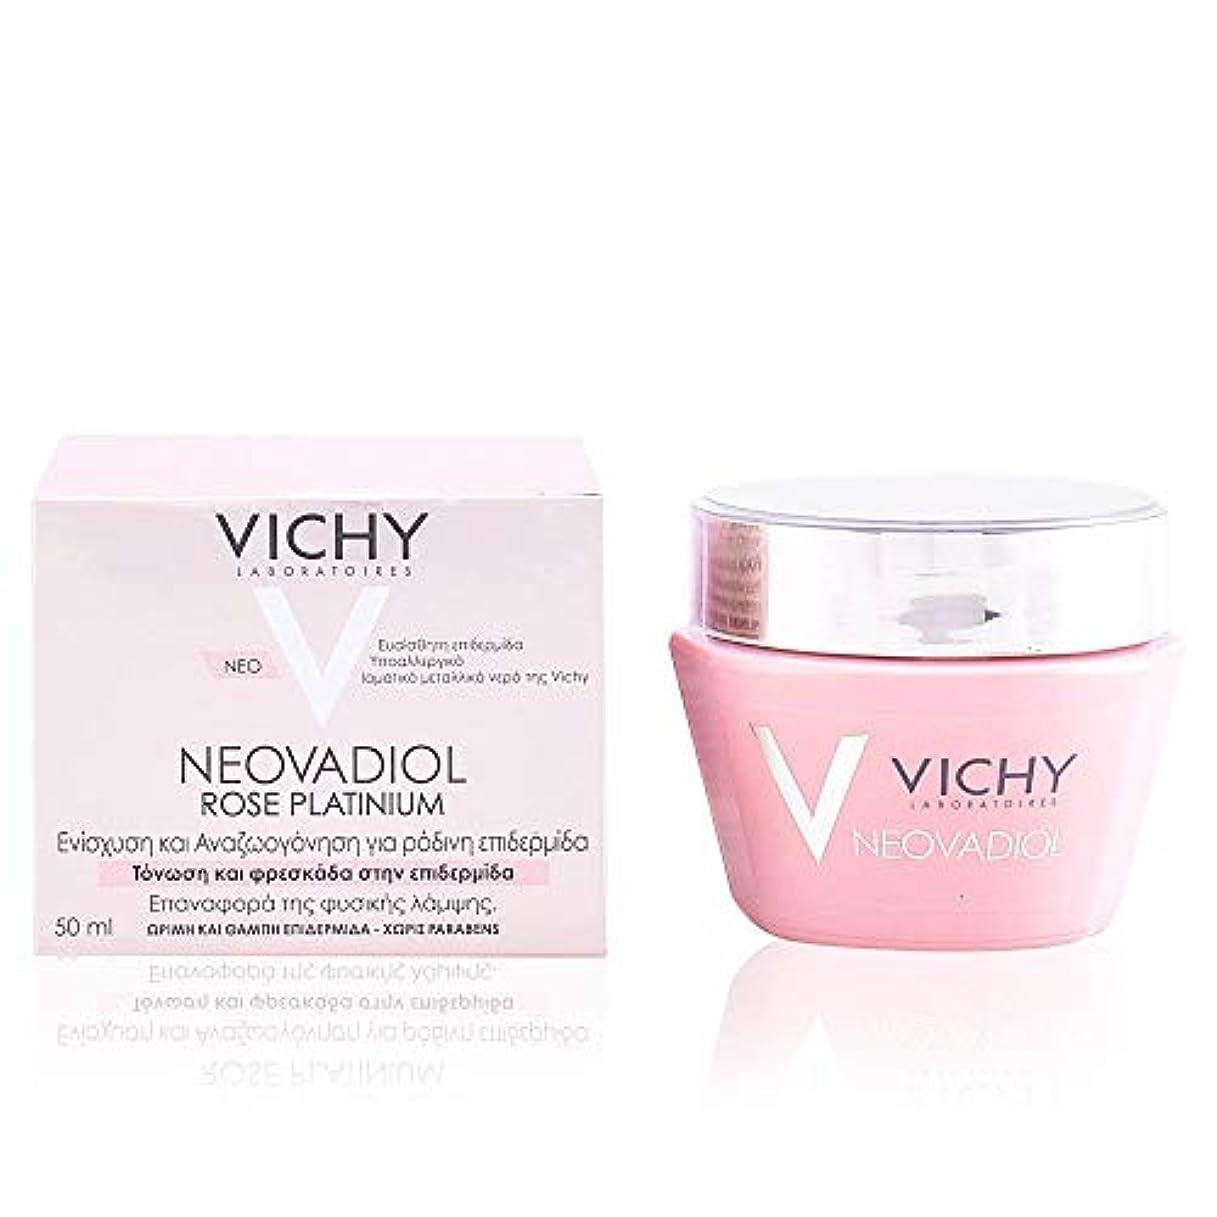 Vichy Neovadiol Rose Platinium Cream 50ml [並行輸入品]